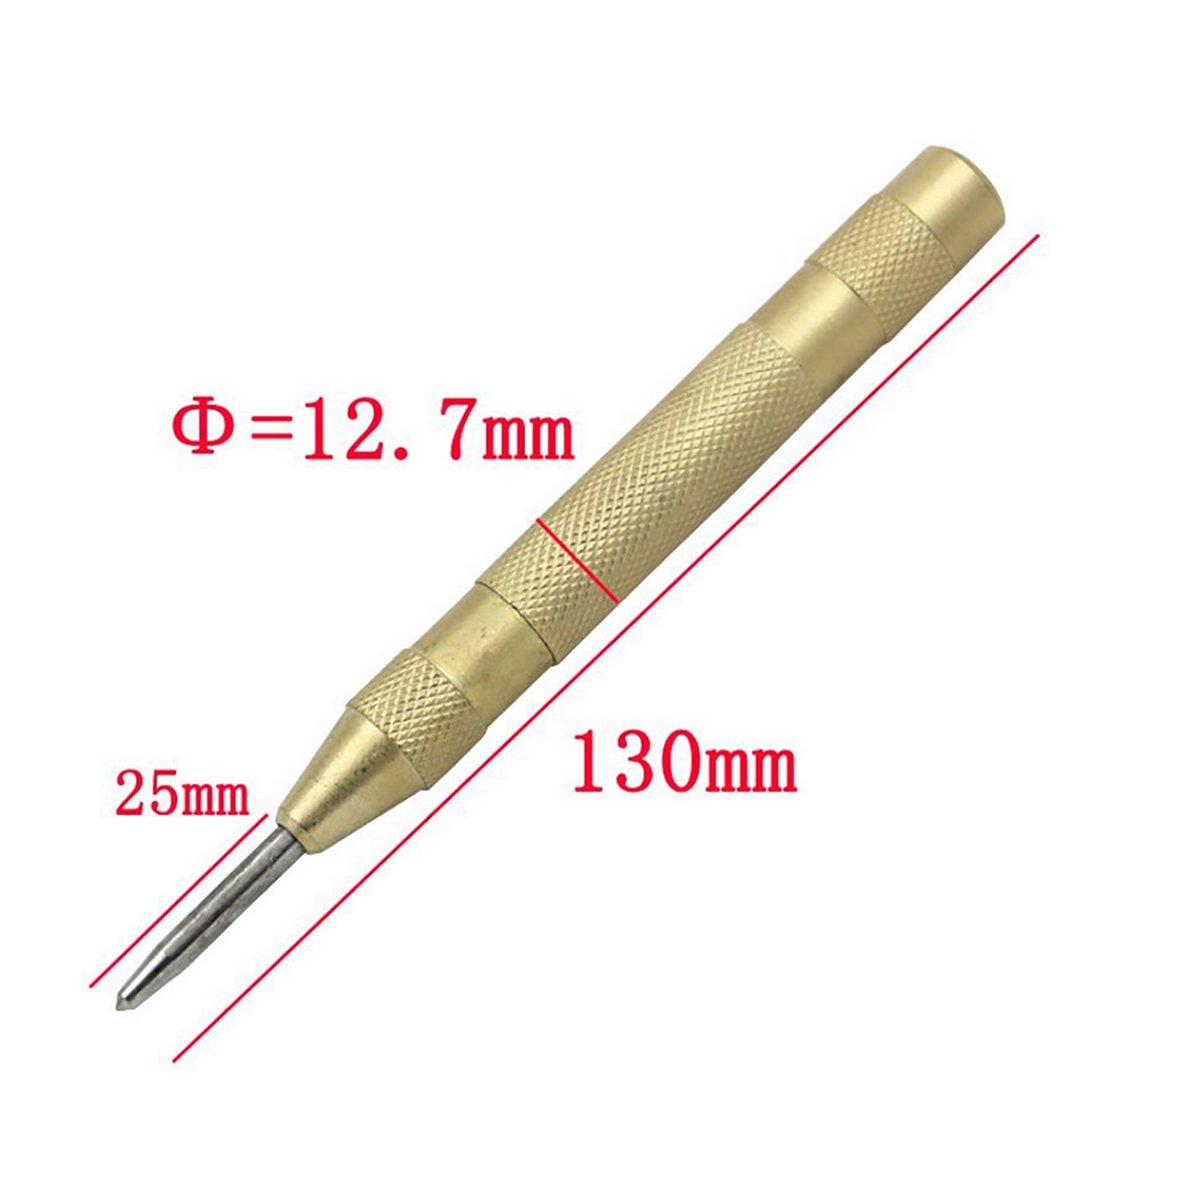 Non-Center Cutting Finish 30 Deg Helix 1.5000 Cutting Diameter Bright 3 Flutes 3.7500 Overall Length Melin Tool R Cobalt Steel Corner Rounding End Mill 1.5 Shank Diameter Uncoated Weldon Shank